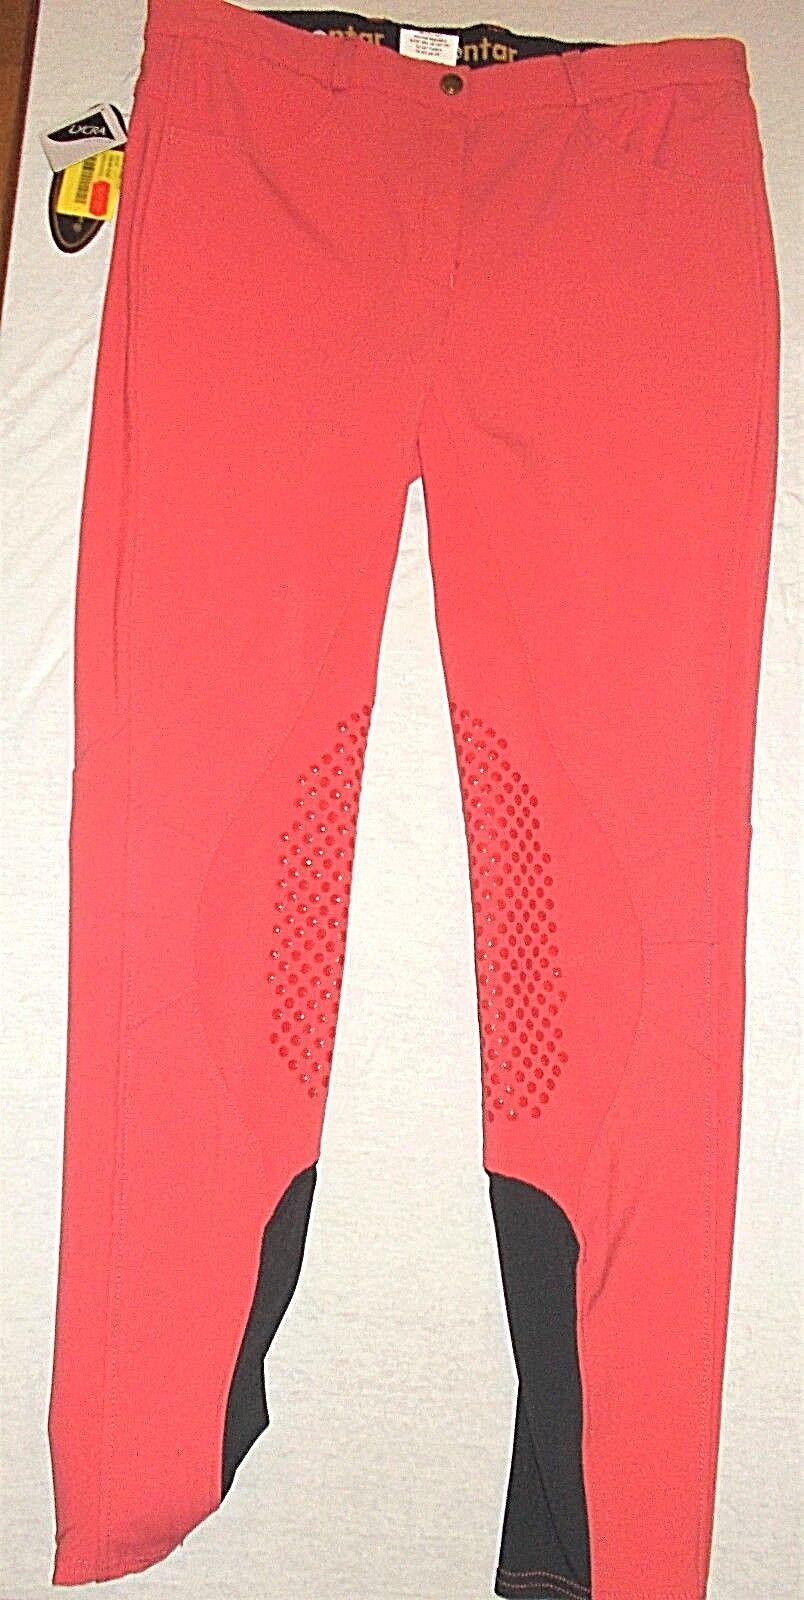 Montar Grip Reithose Kniebesatz, red, Gr. 40(519a)